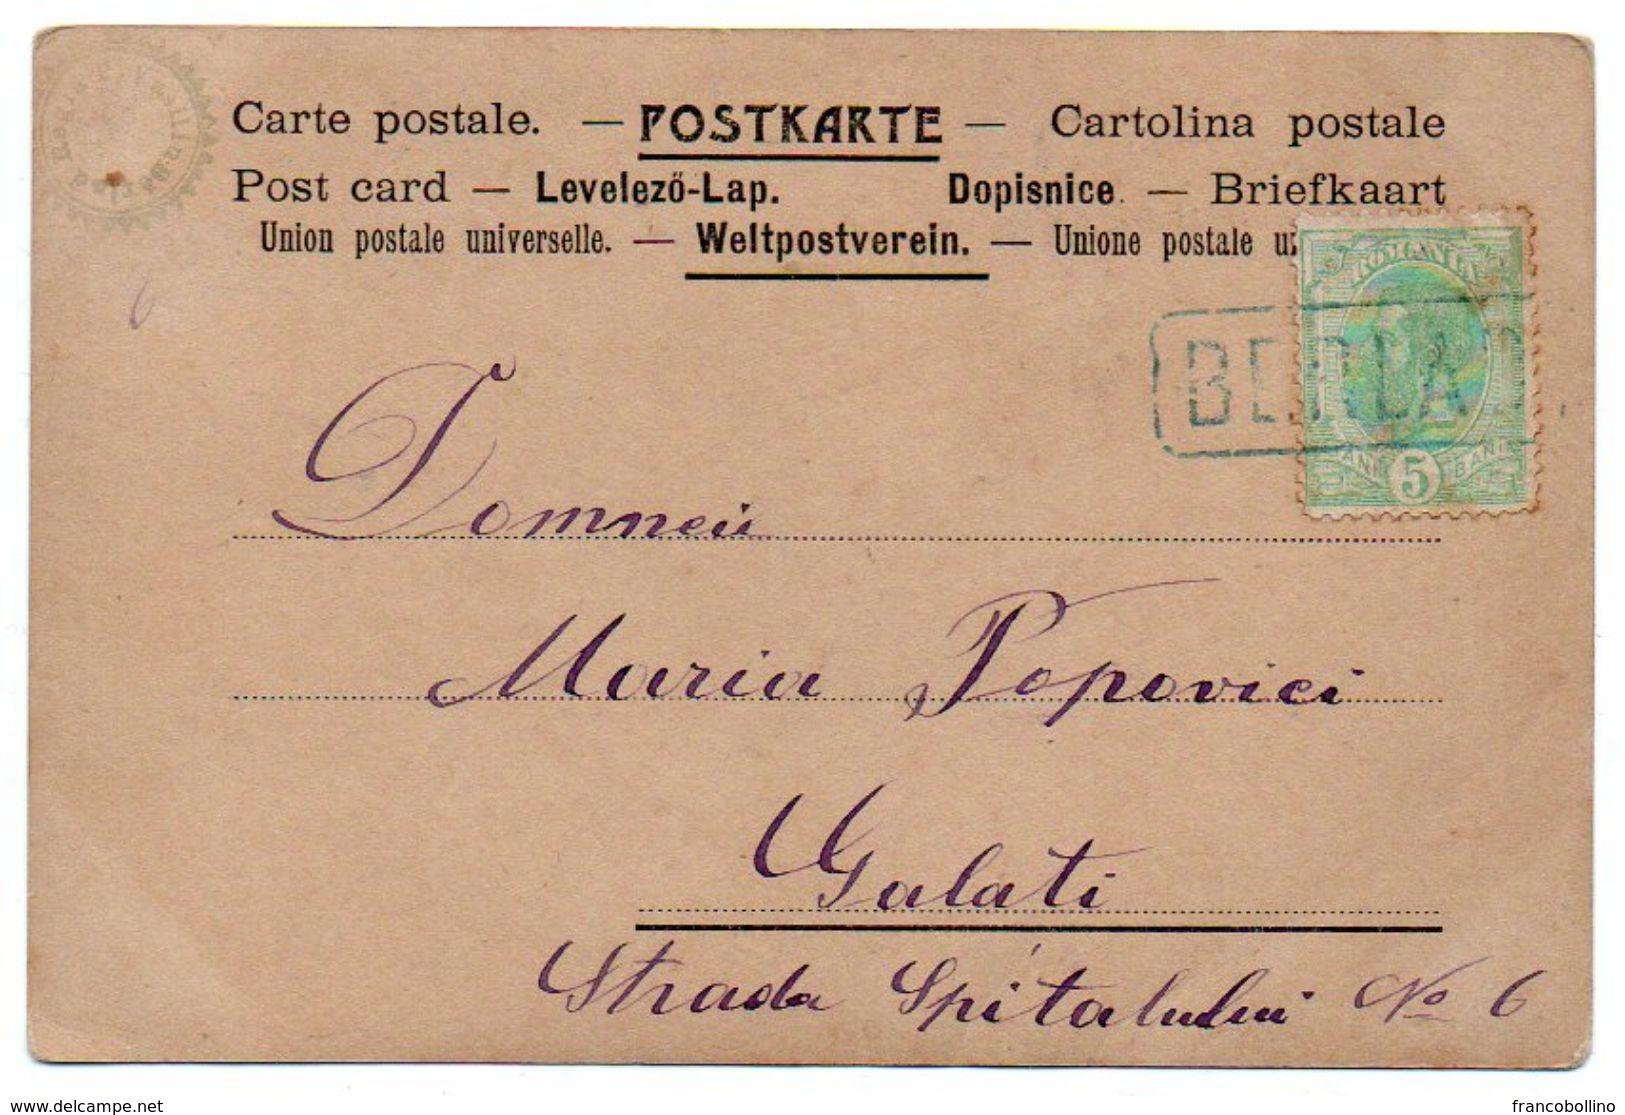 ROMANIA/ROUMANIE - BERLAD/BARLAD - PORTRAIT OF ACTRESS ?? / CANCEL BERLAD - 1901 - Romania